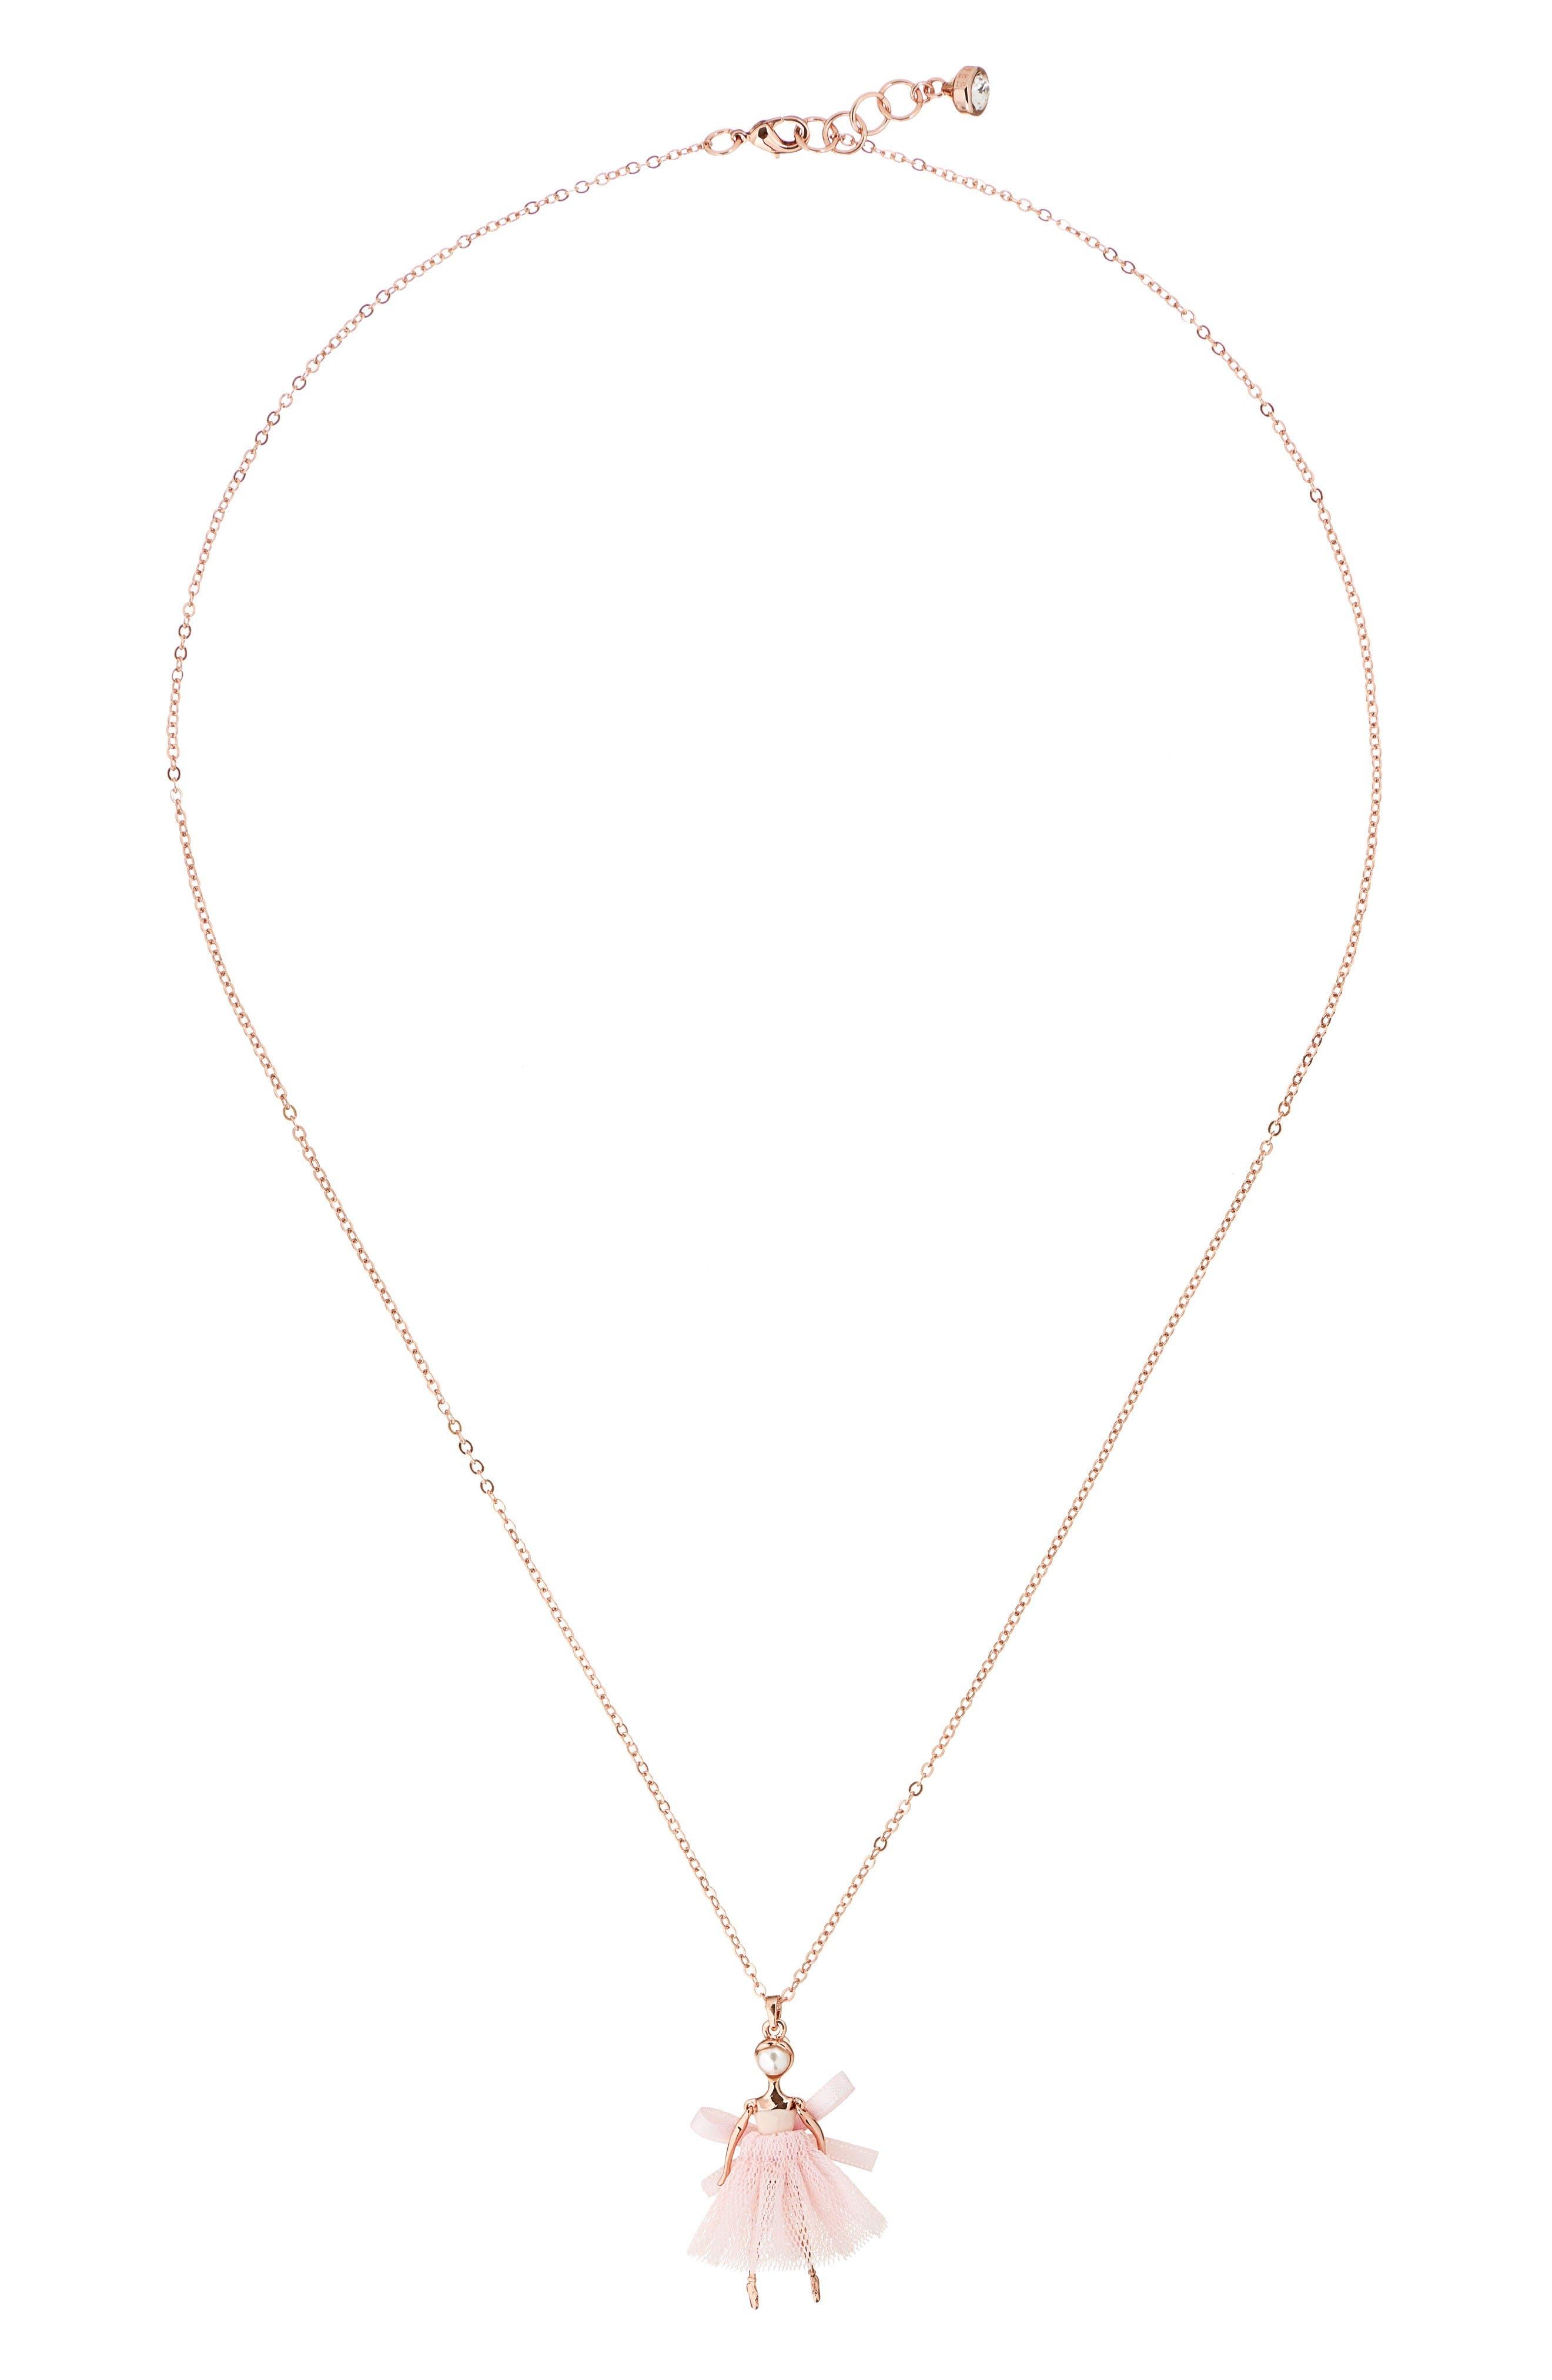 Carabel Ballerina Pendant Necklace,                         Main,                         color, Nude Pink